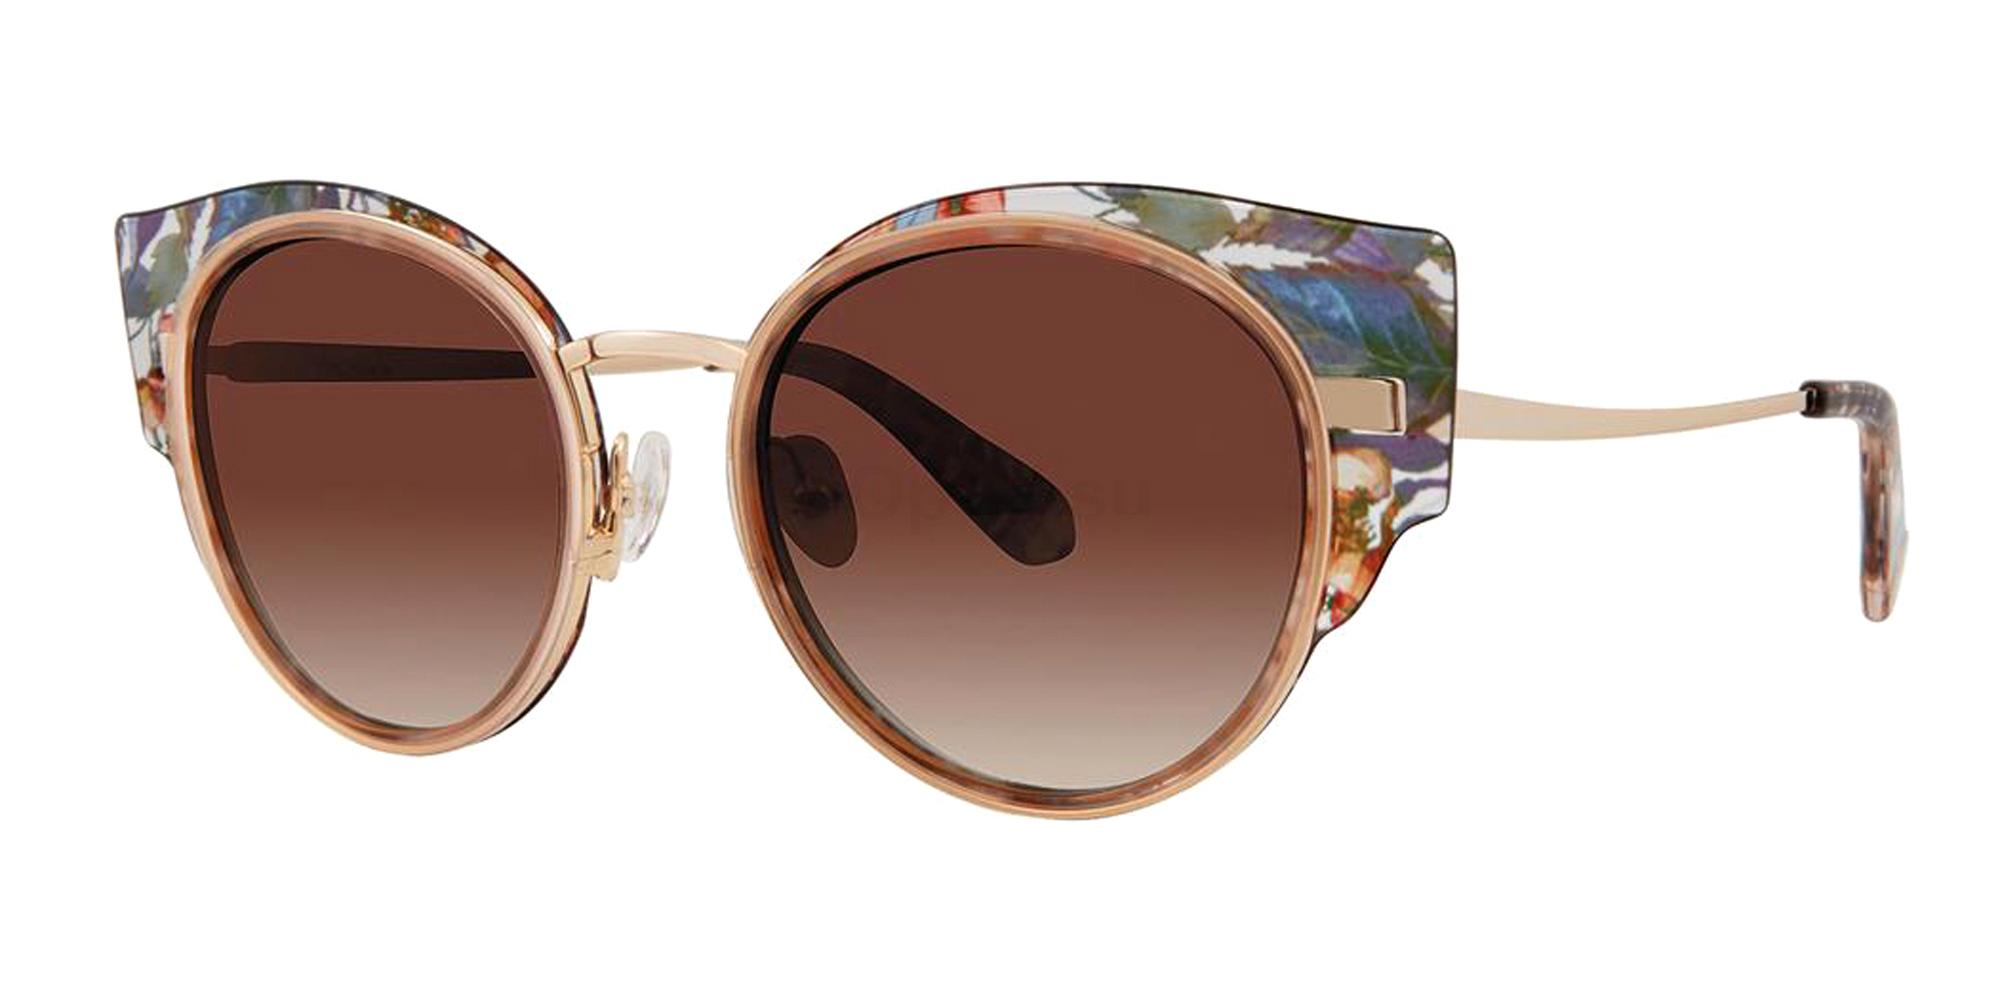 Autumn TRUVY Sunglasses, Zac Posen